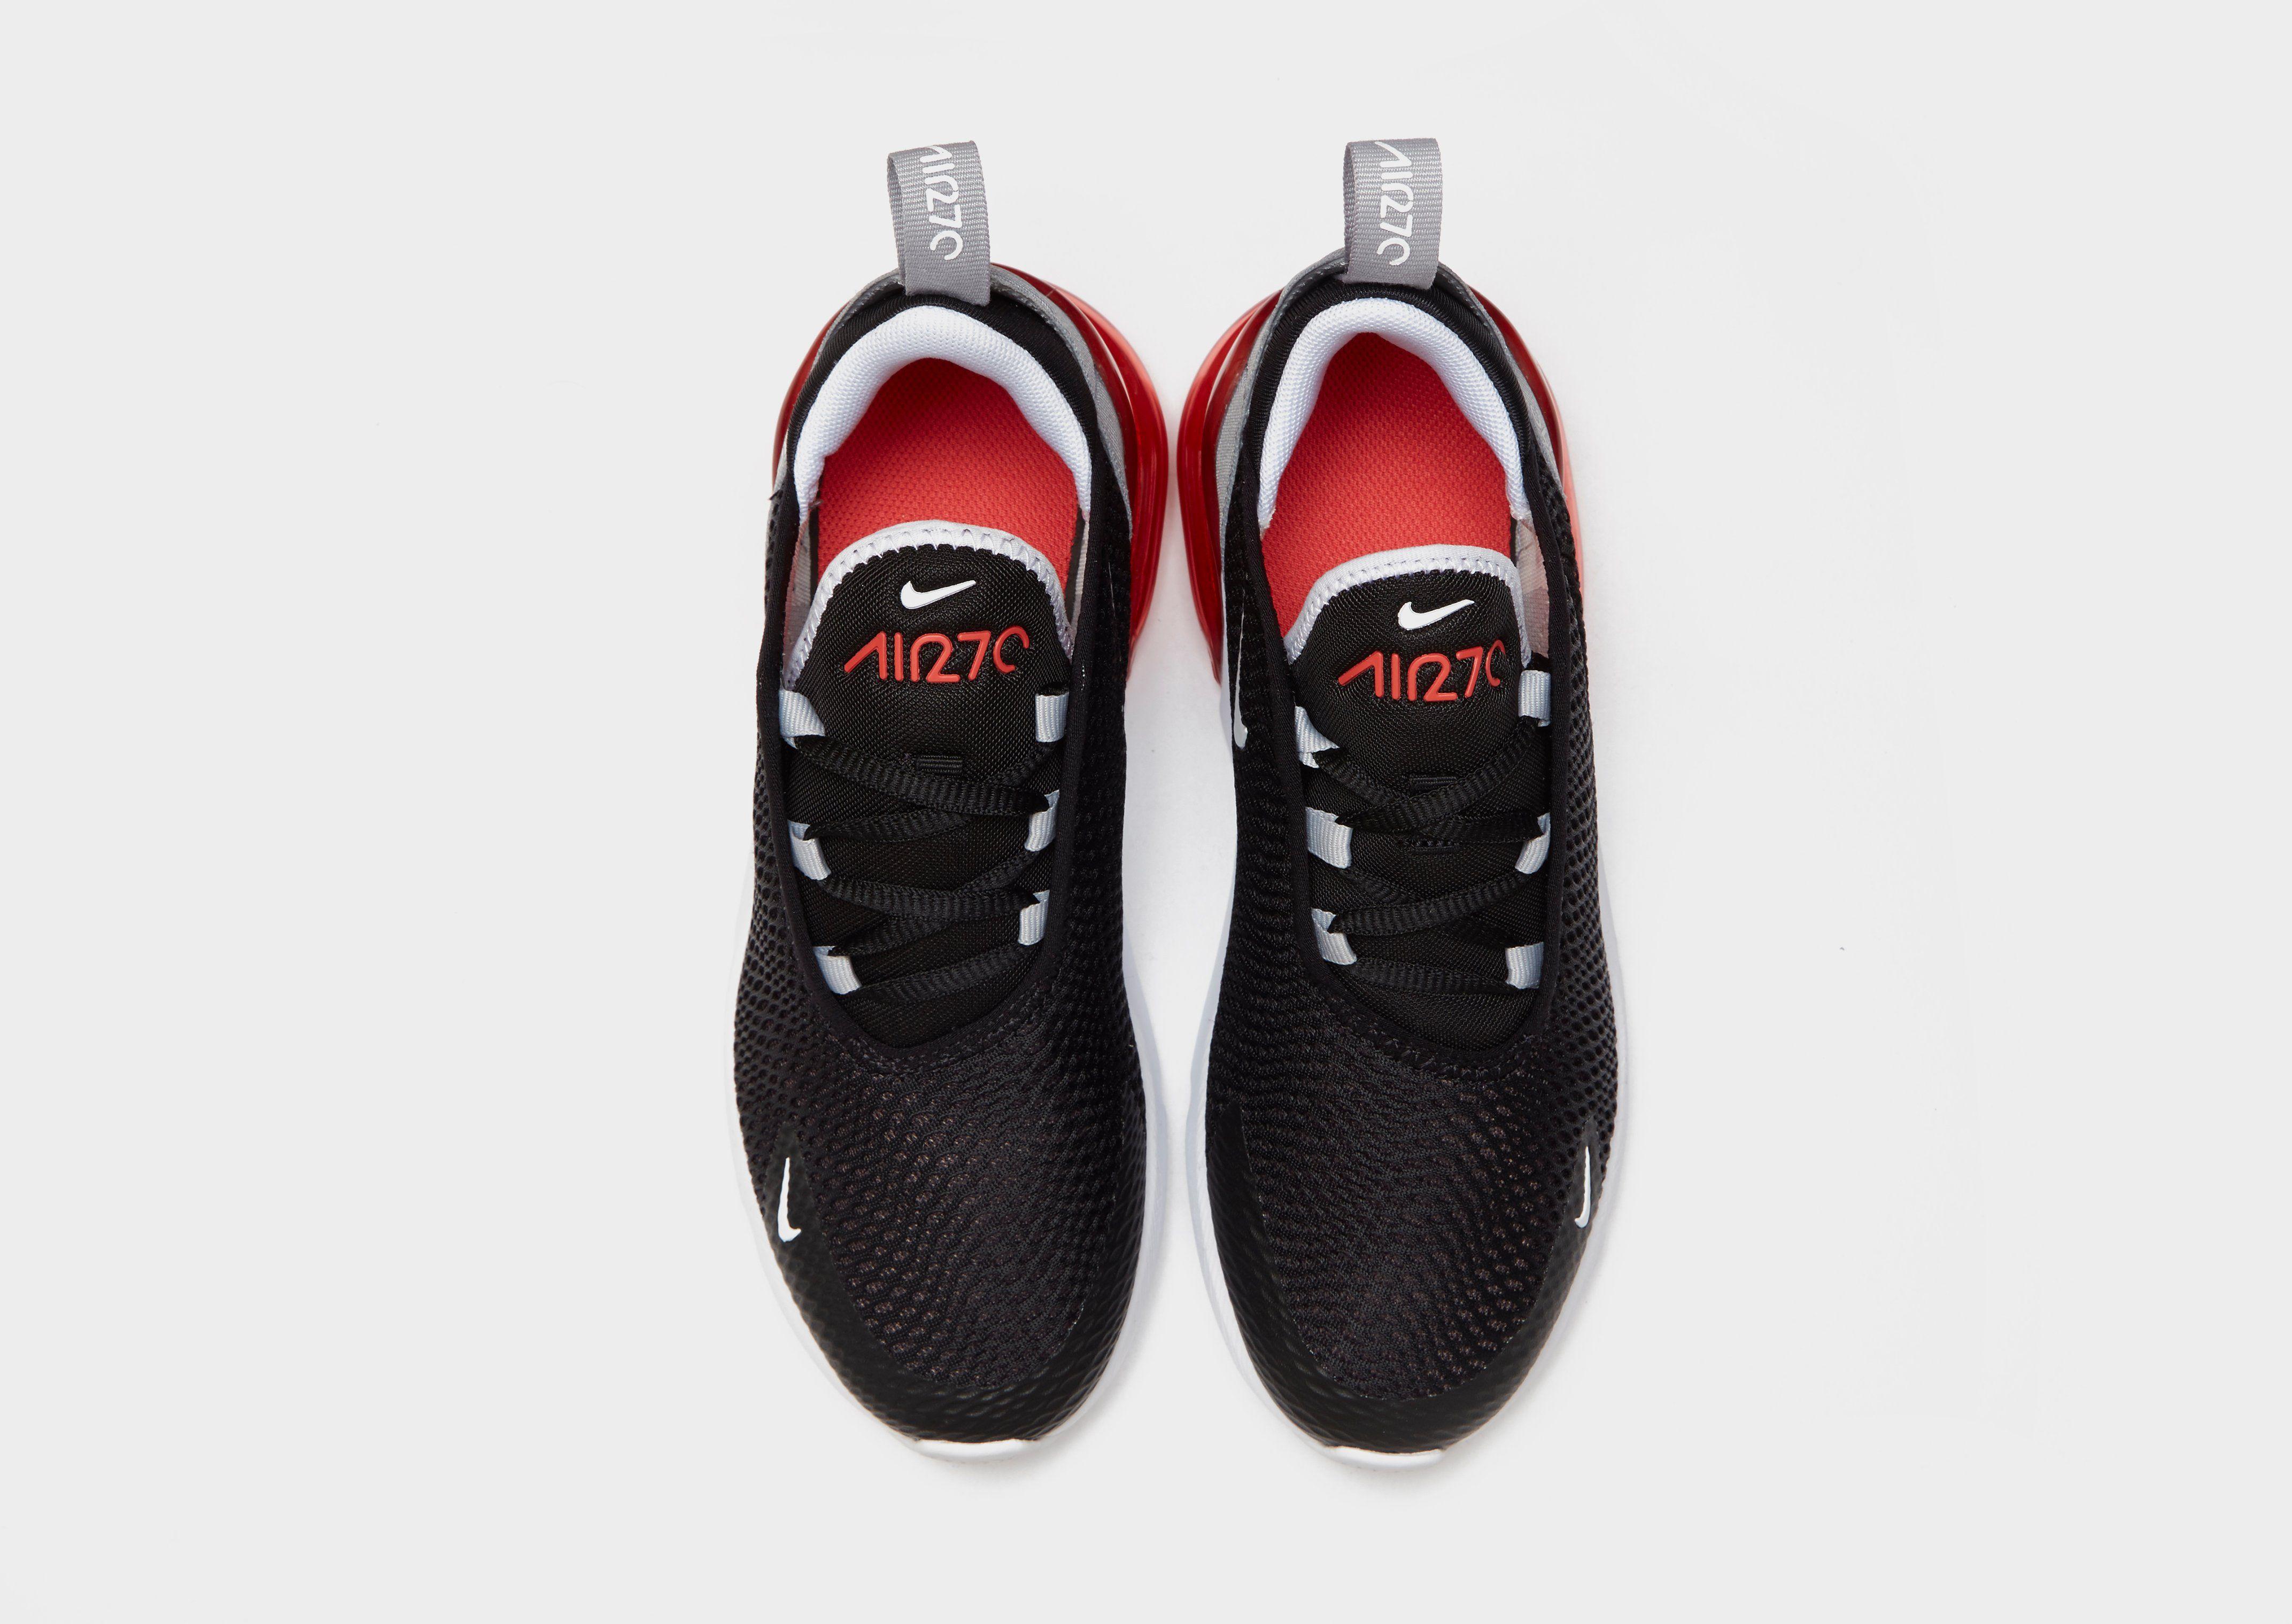 Nike Air Max 270 Enfant